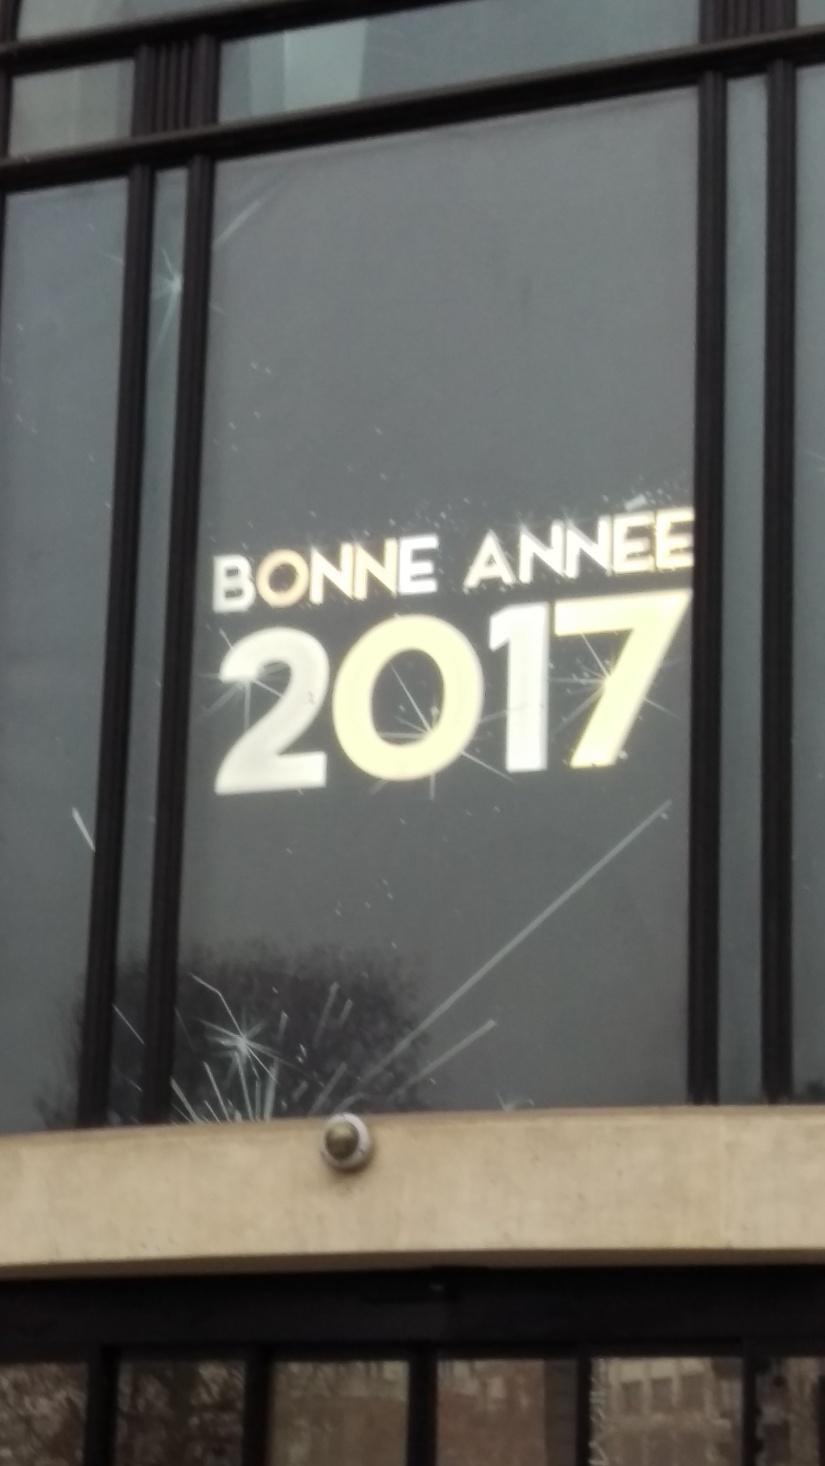 A 2017 summary